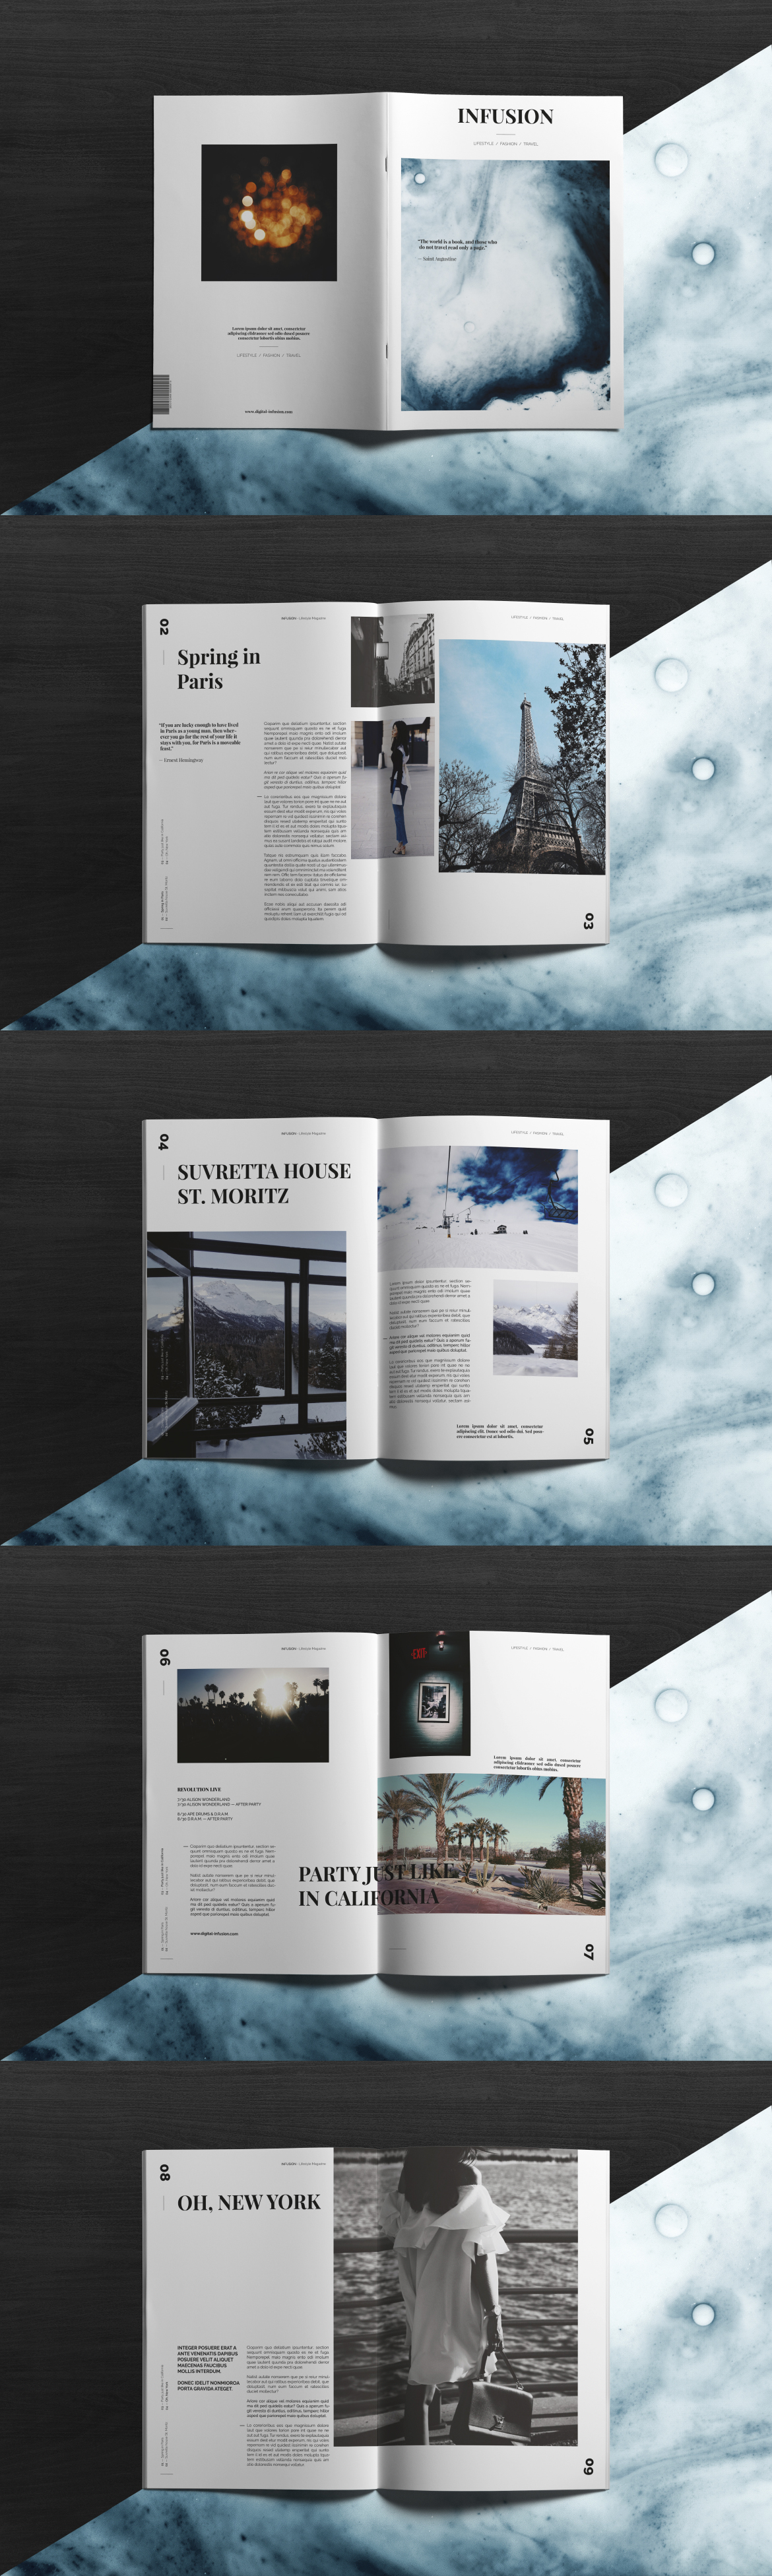 INFUSION — Lifestyle Magazine Template InDesign INDD | Best Magazine ...